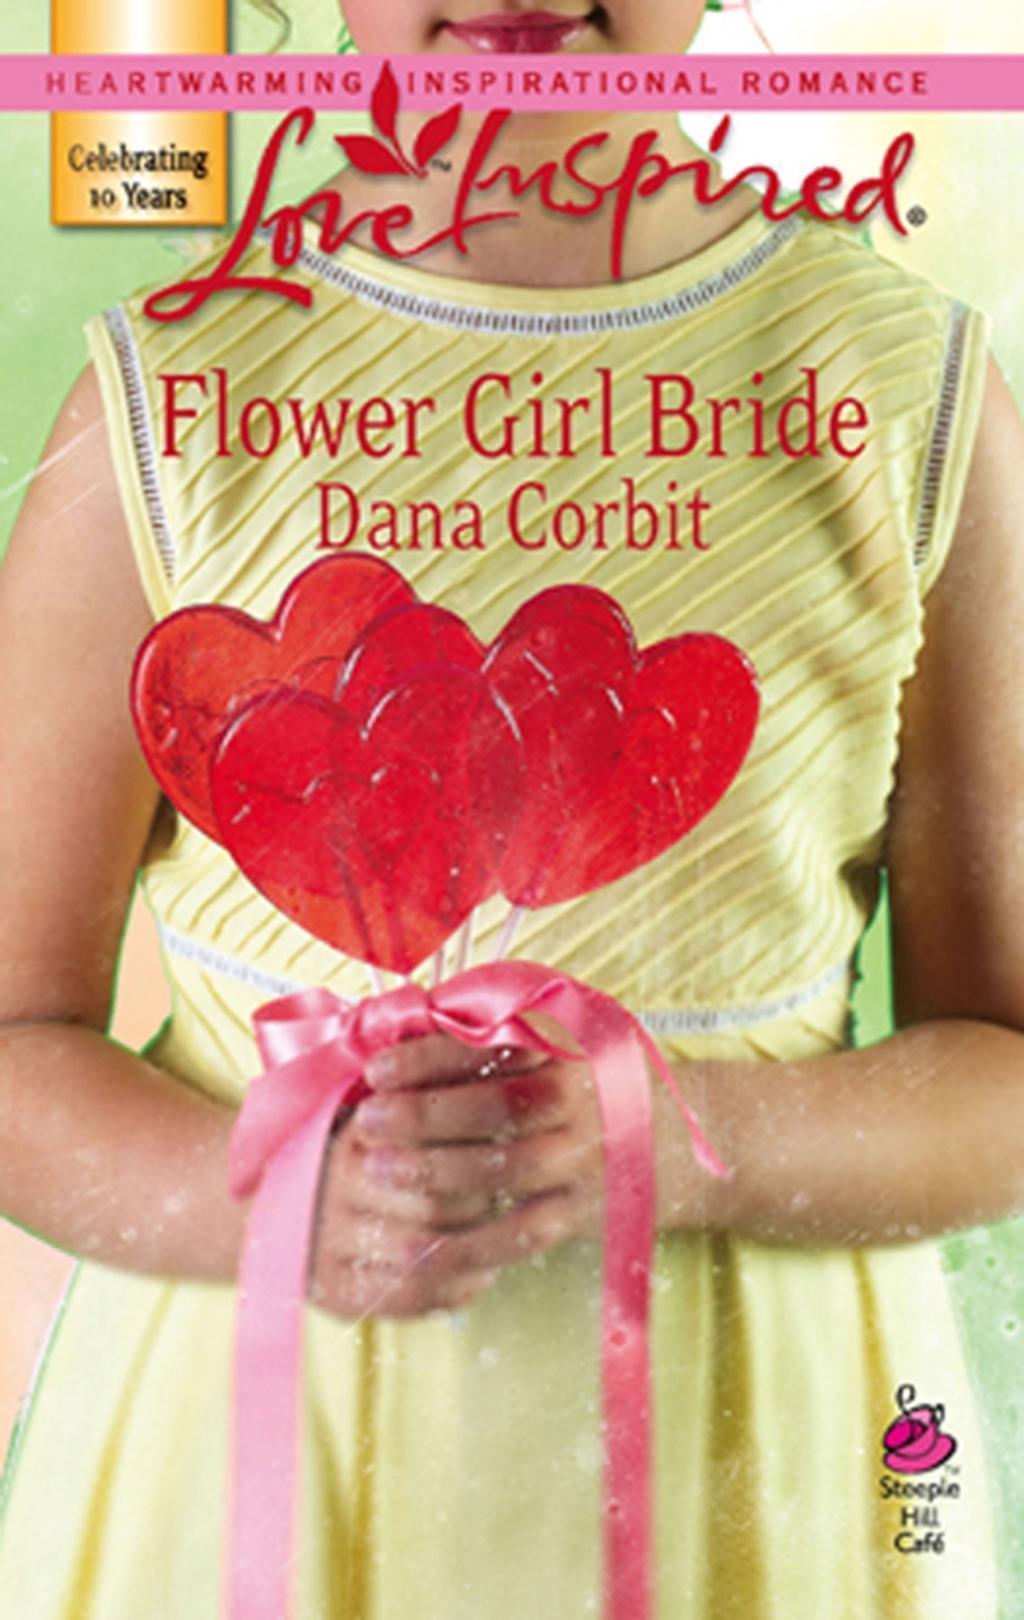 Flower Girl Bride (Mills & Boon Love Inspired) (Steeple Hill Café, Book 4)